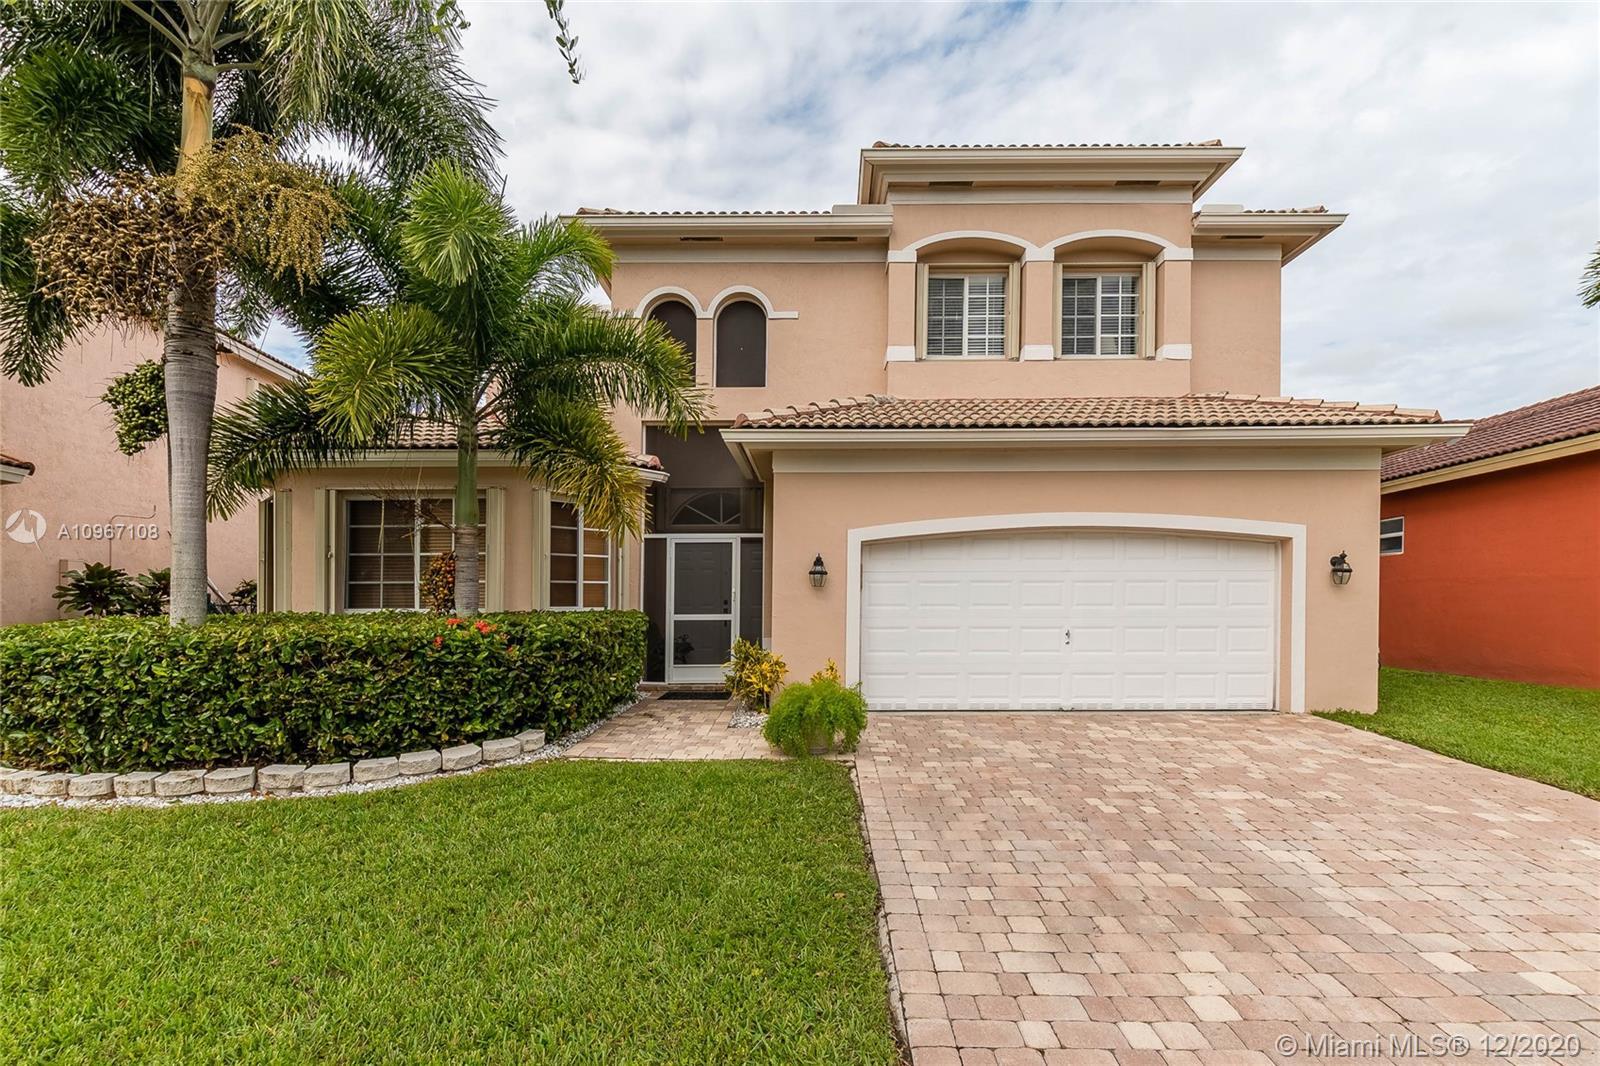 1457 SE 22nd Ln Property Photo - Homestead, FL real estate listing